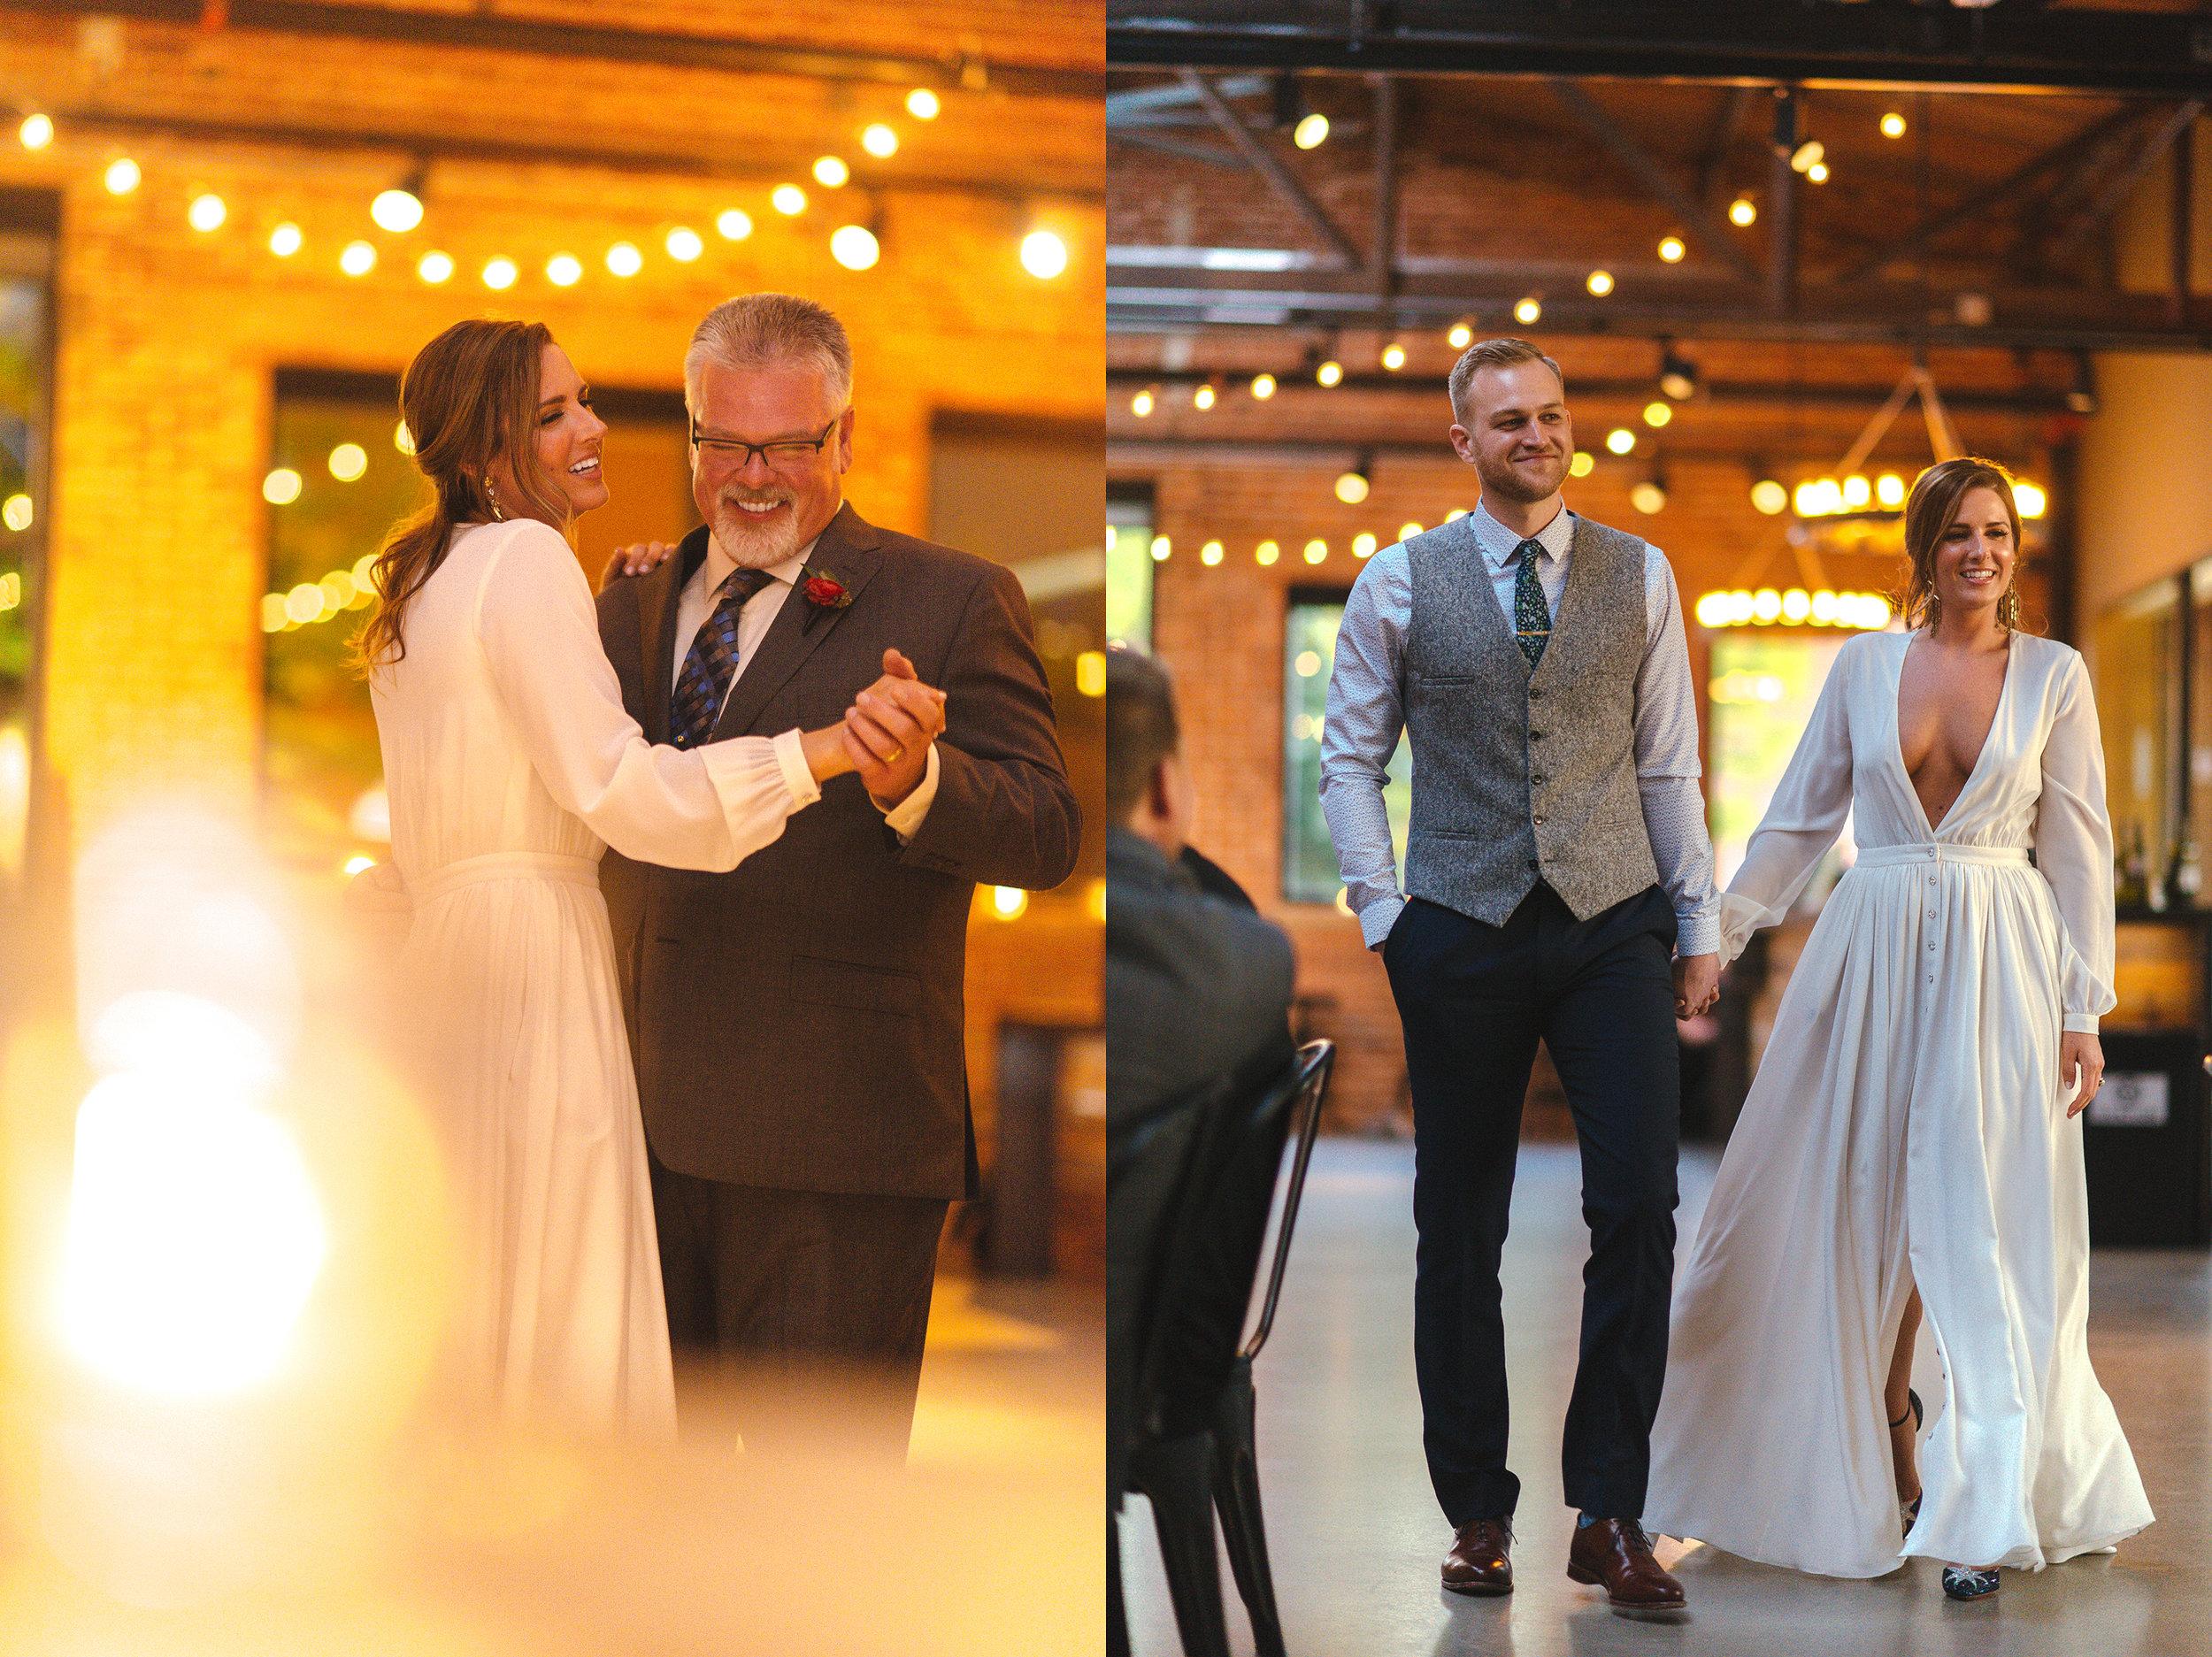 chicago_wedding_photography_zoe_rain_41.jpg